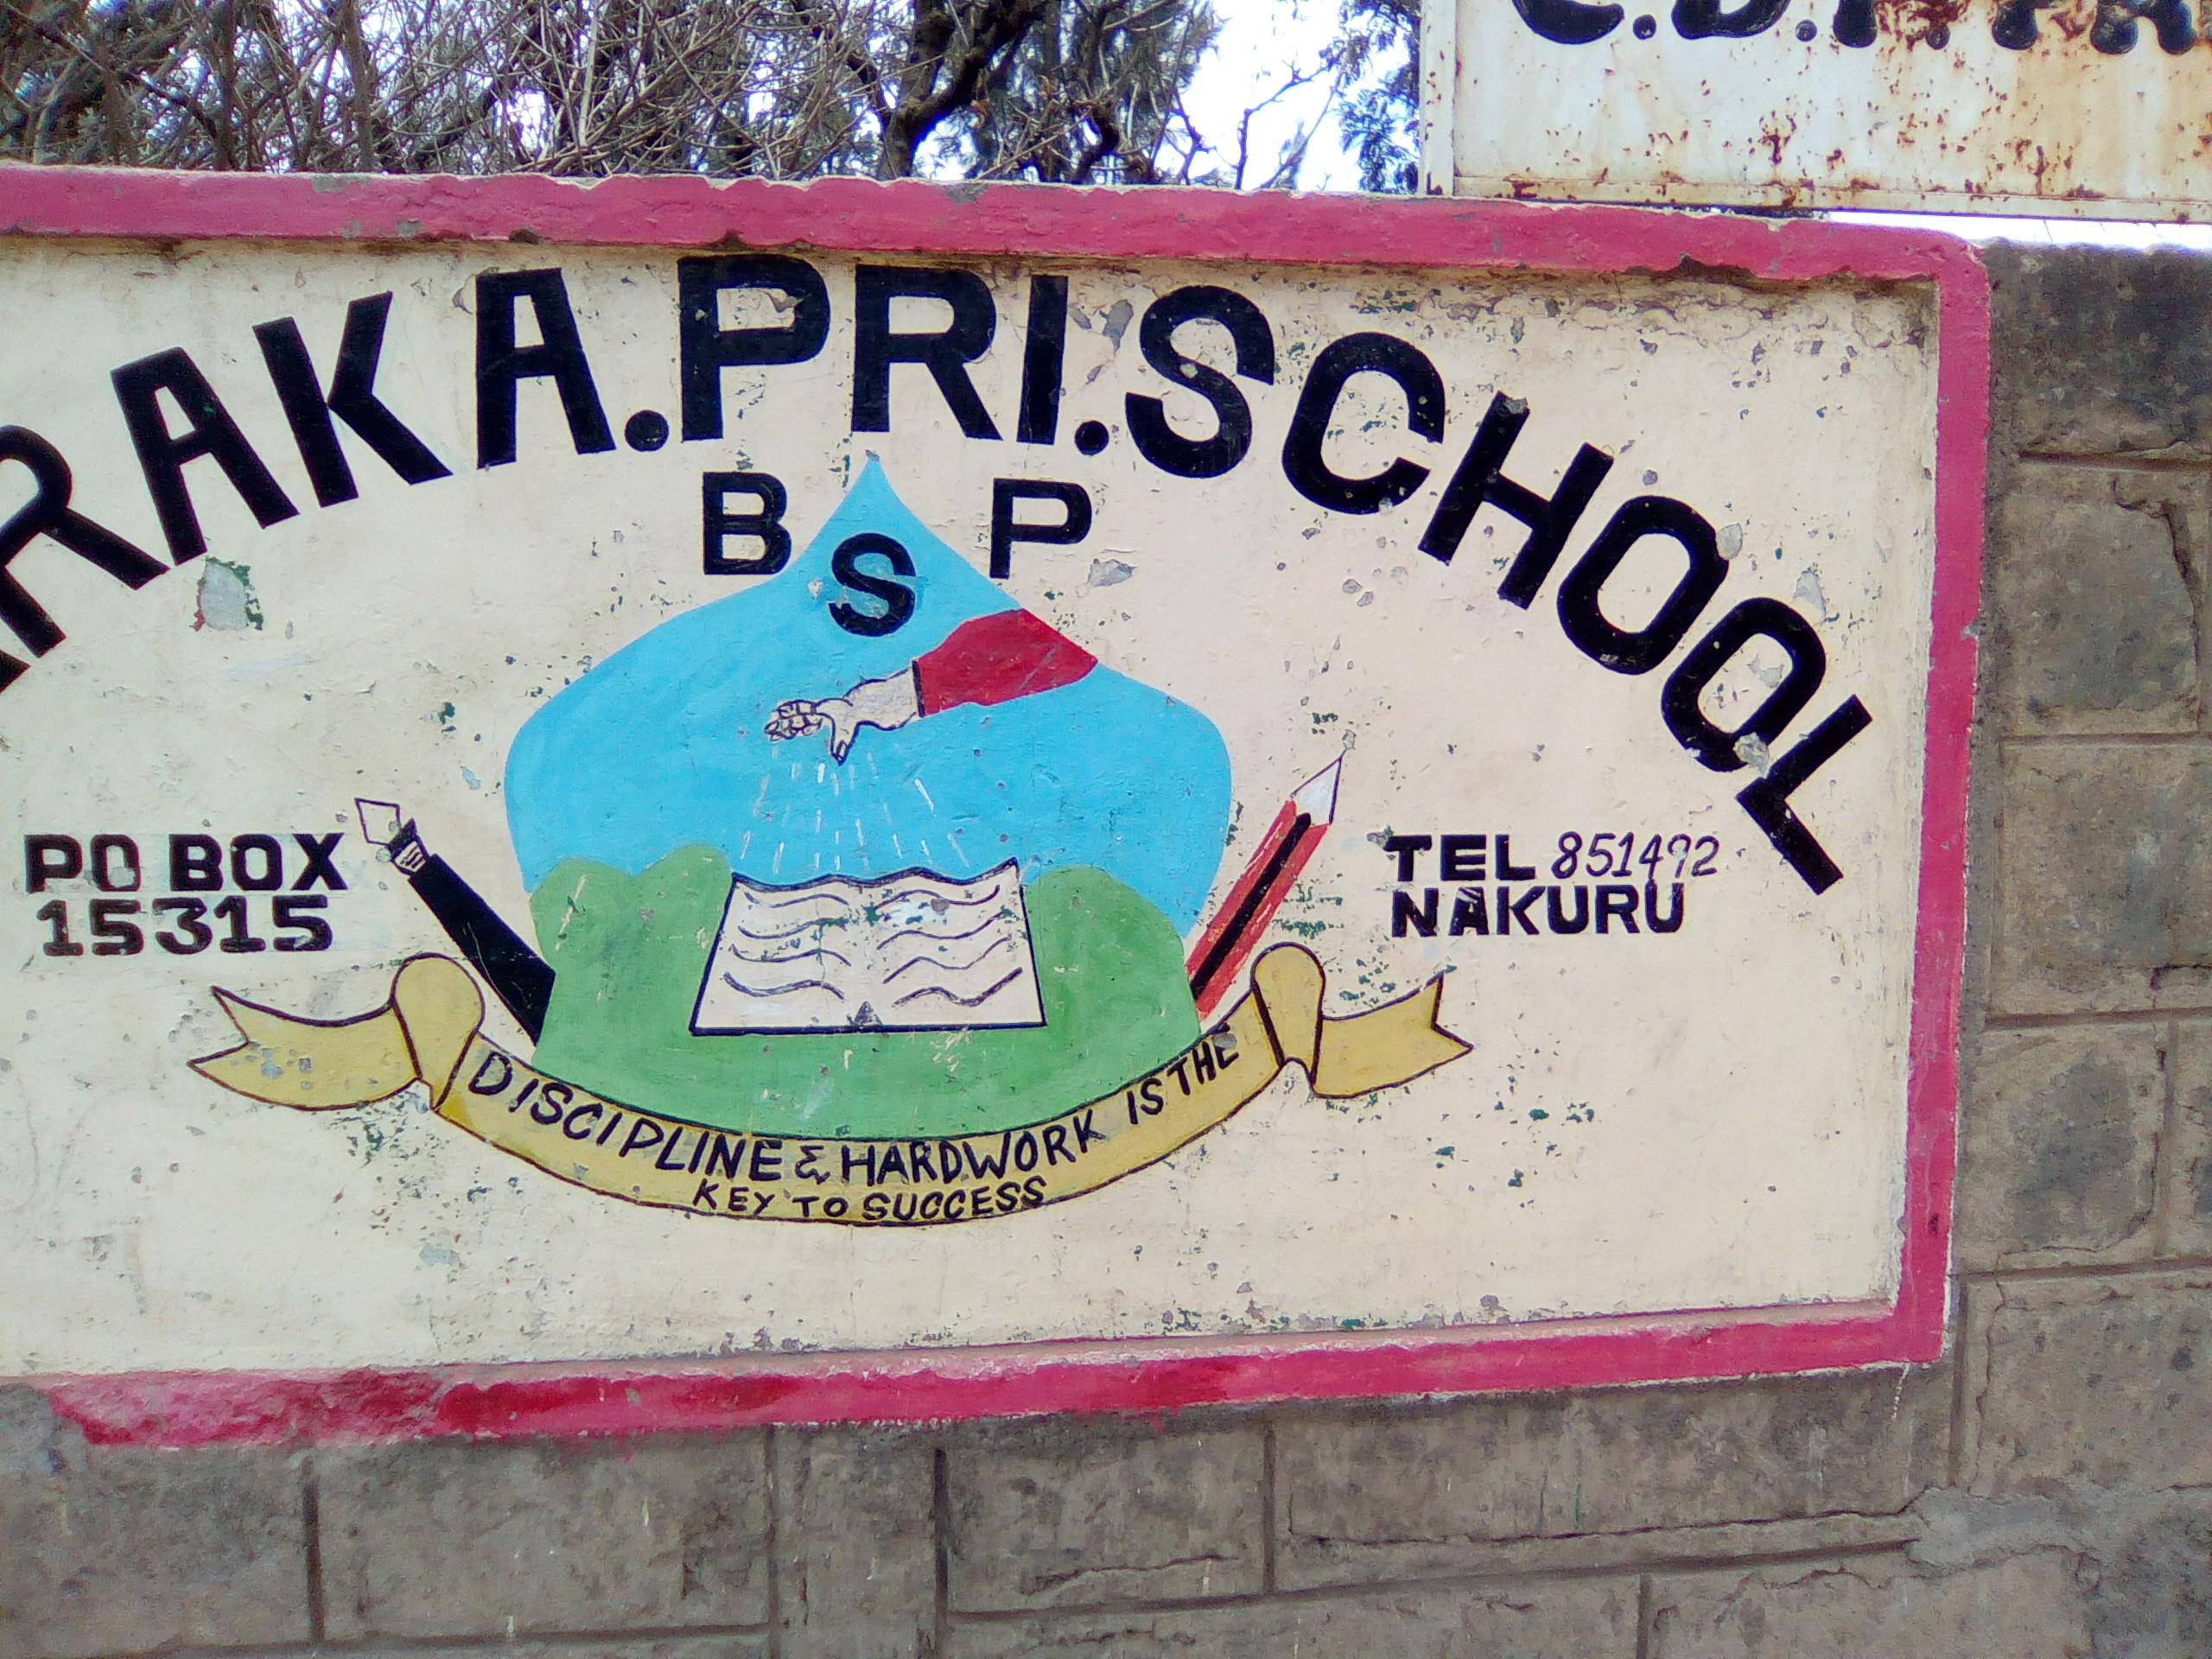 Baraka Primary School